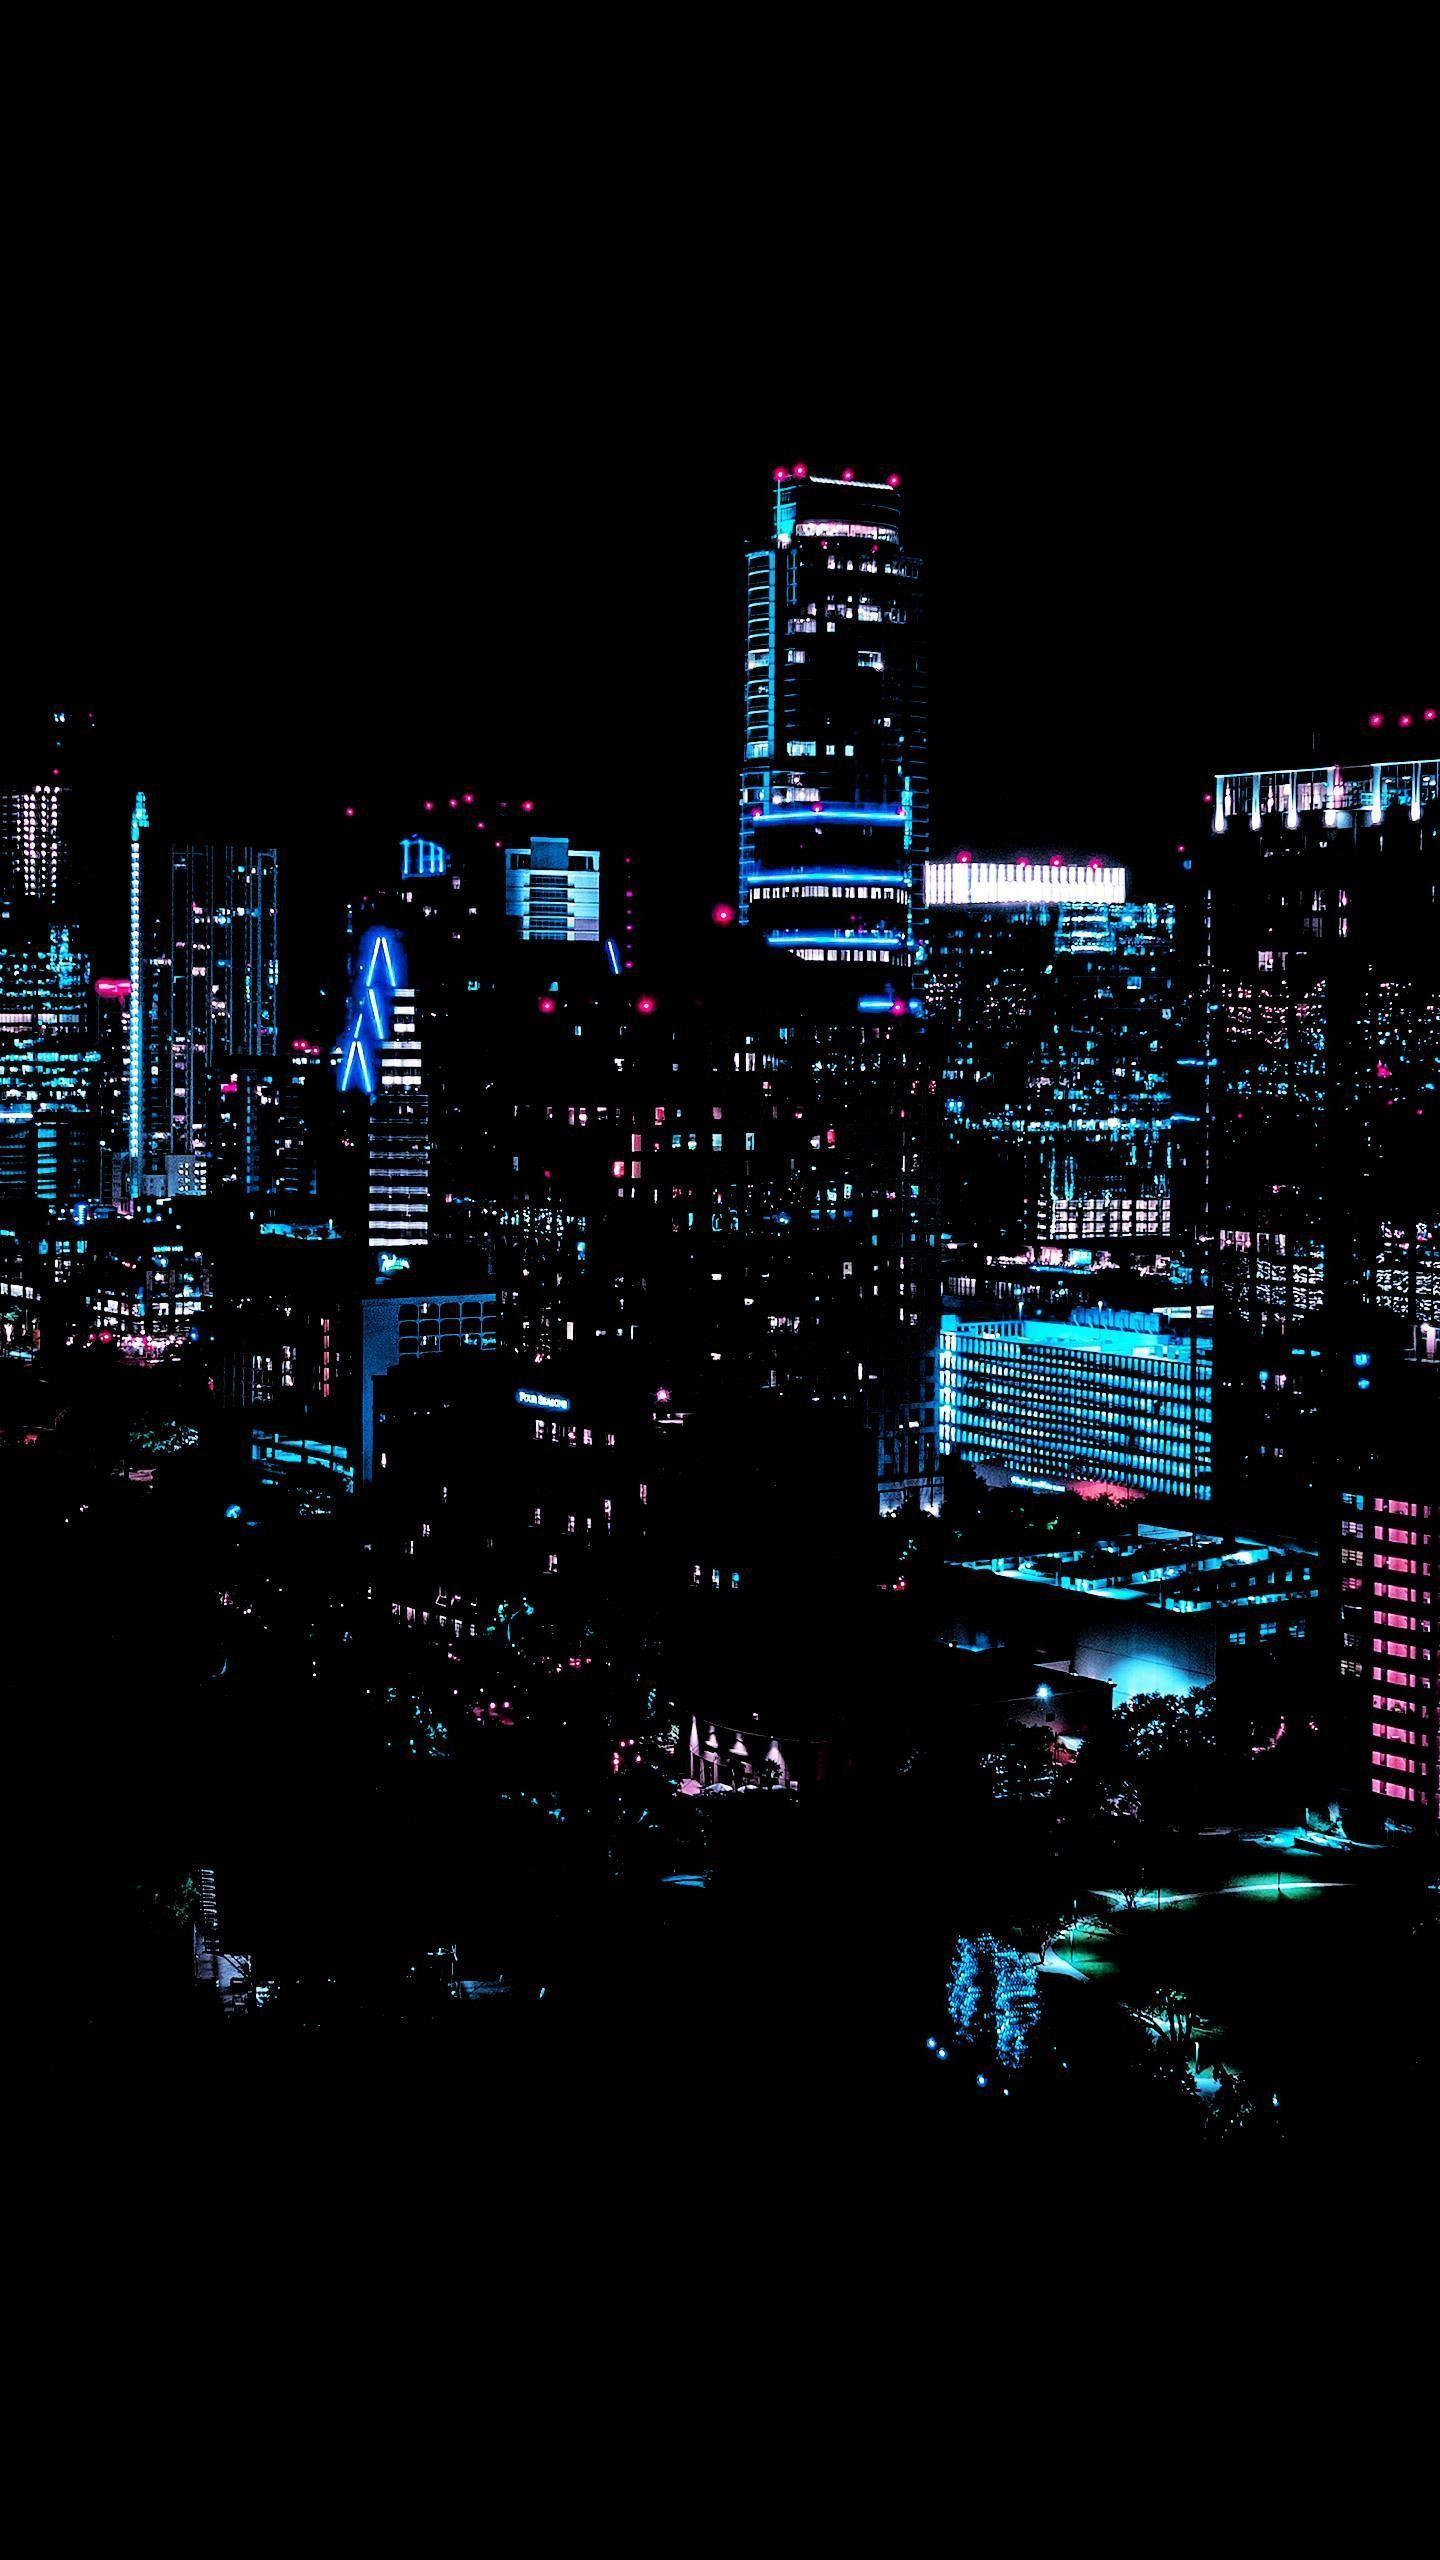 Dark City Aesthetic Wallpapers Top Free Dark City Aesthetic Backgrounds Wallpaperaccess